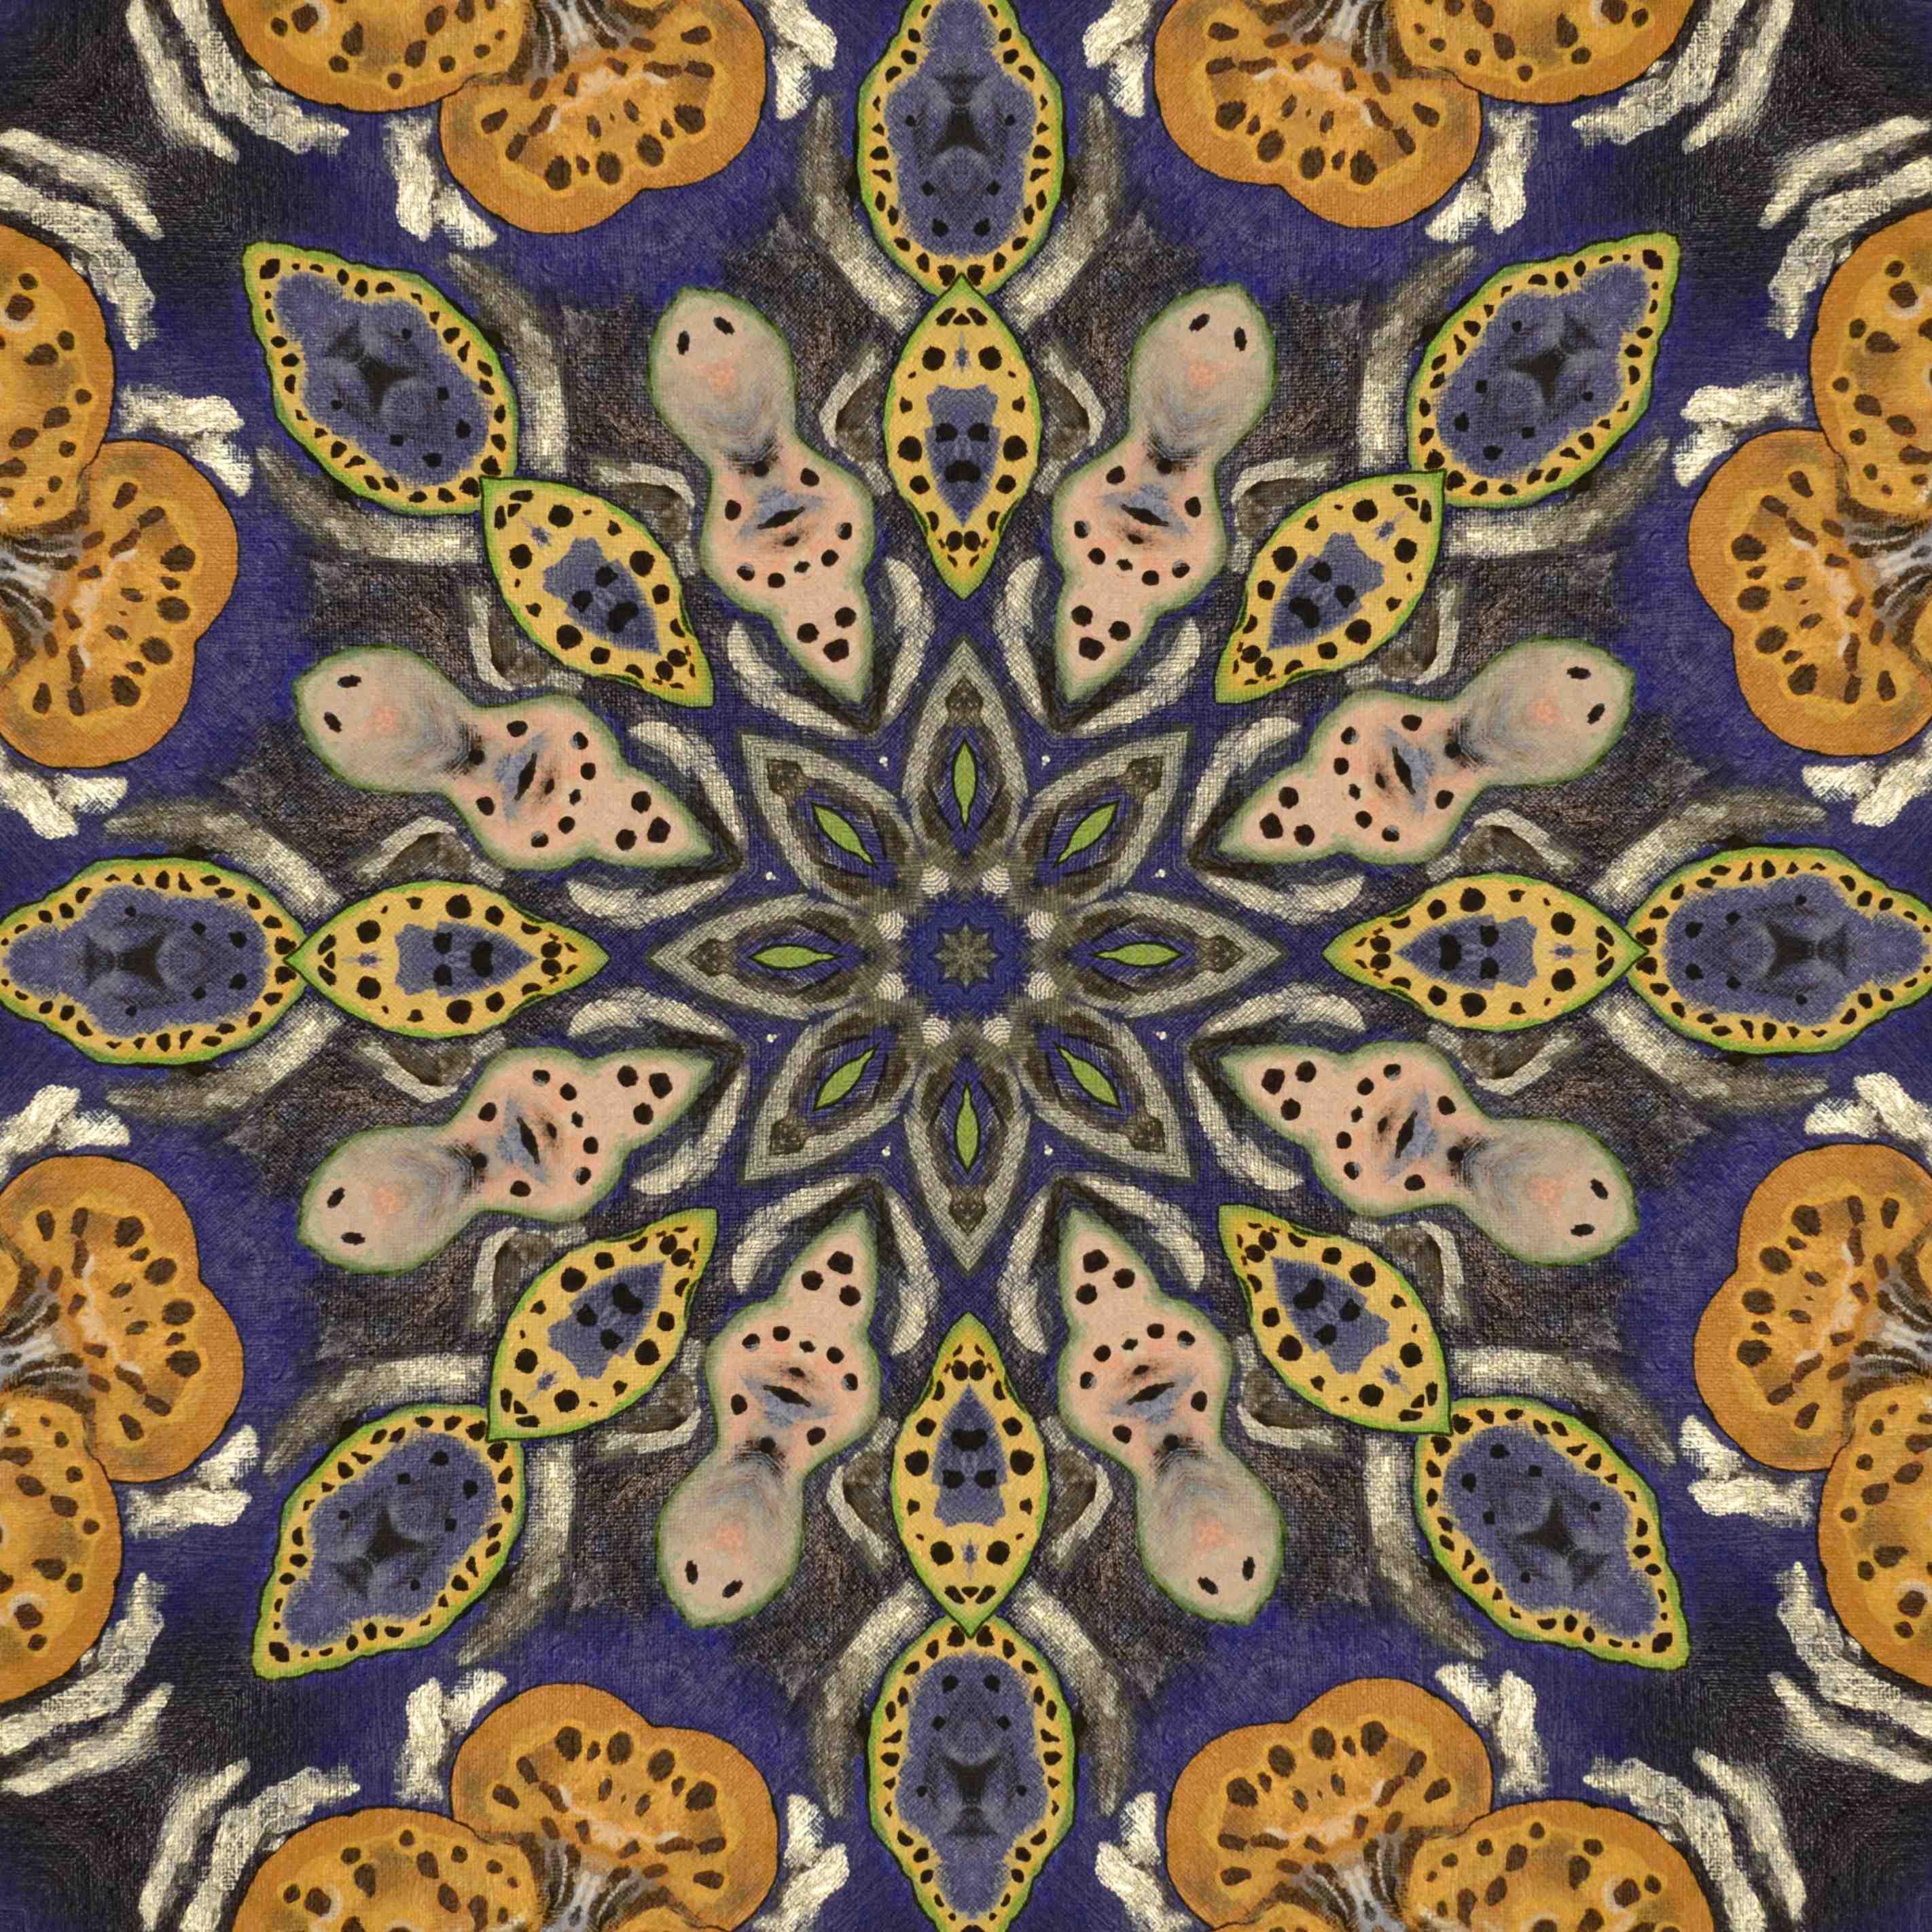 Fabric design GB _7i.jpg